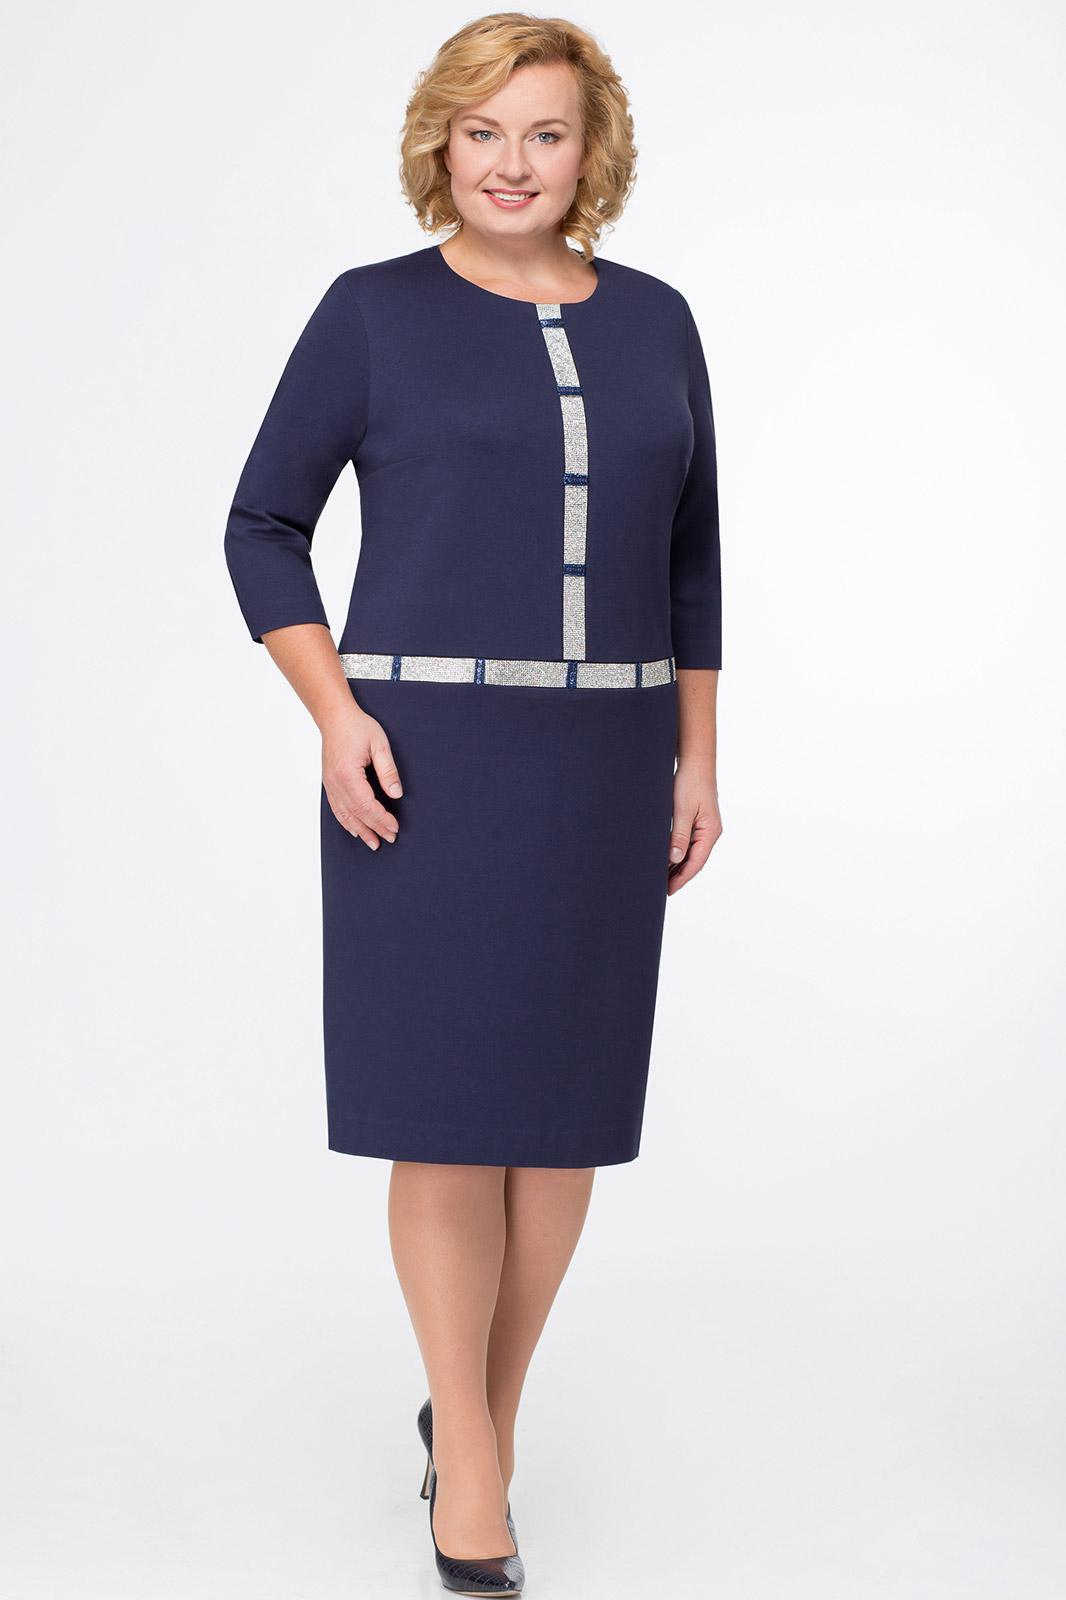 Купить Платье Svetlana Style, 1003 темно-синий, Беларусь